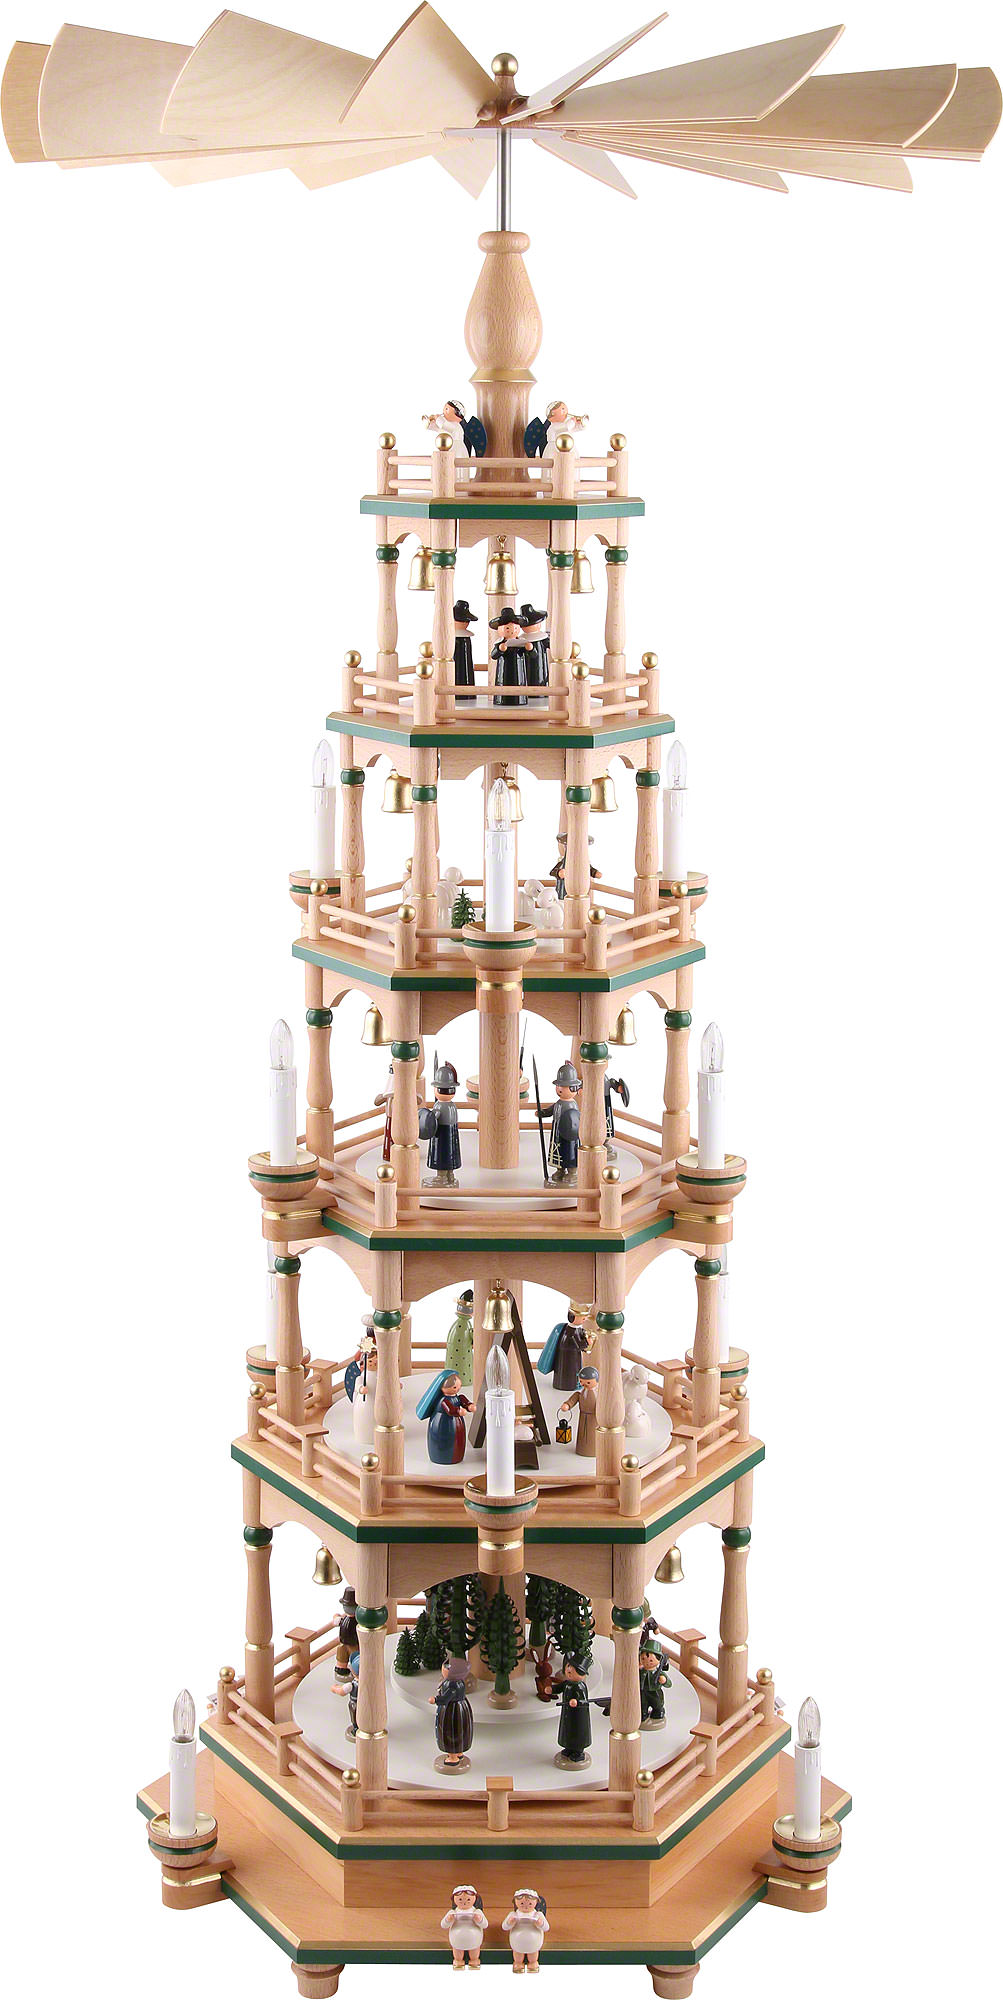 6 st ckige pyramide paradies 106 cm von kwo. Black Bedroom Furniture Sets. Home Design Ideas